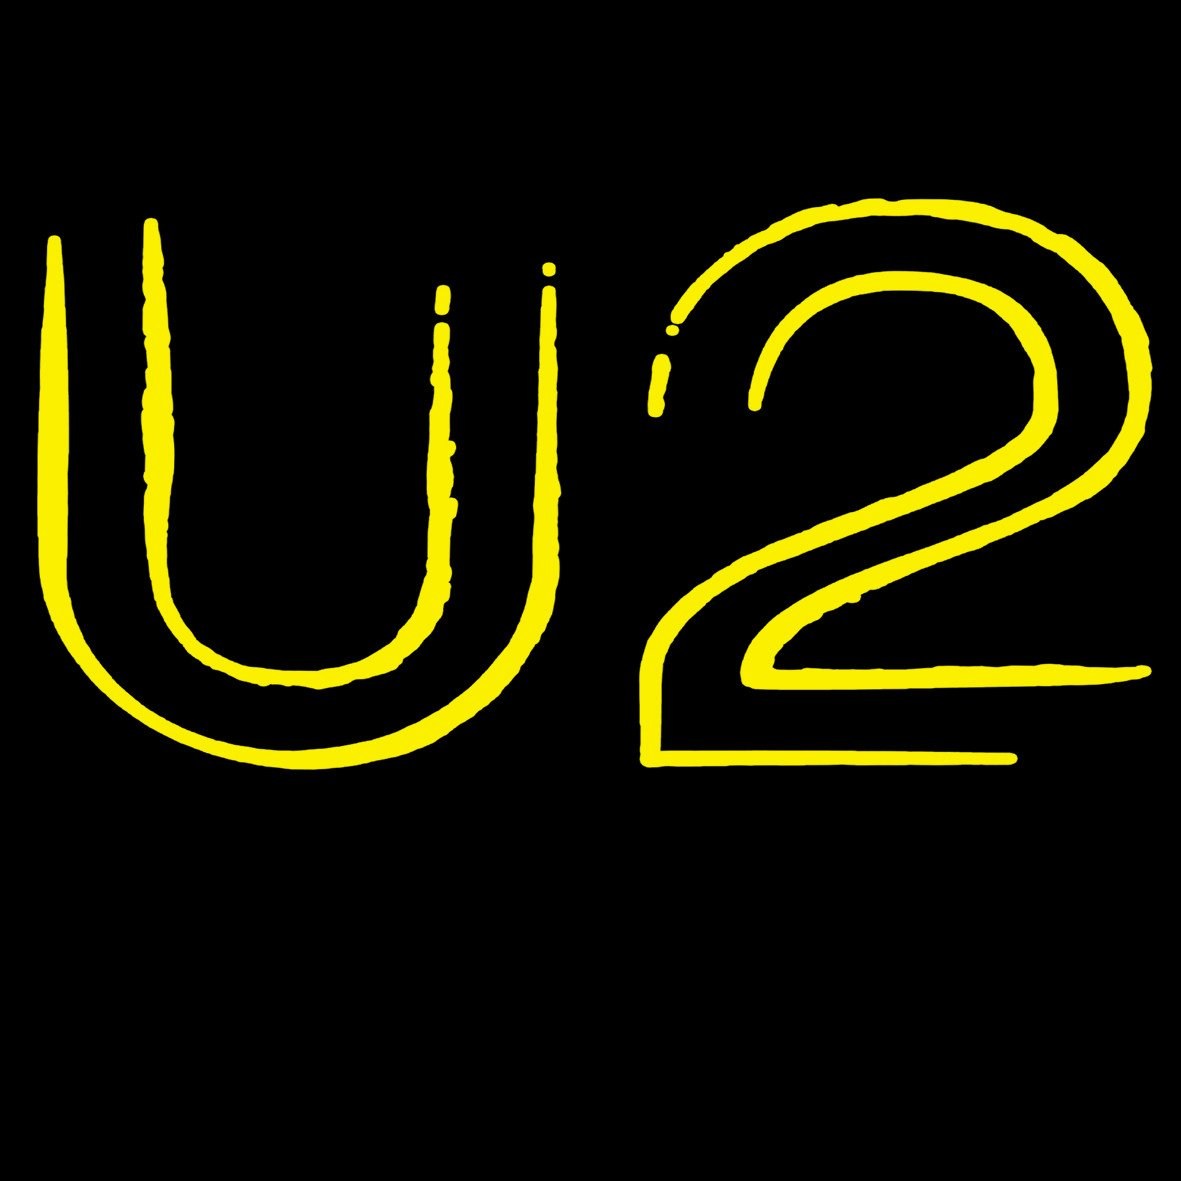 U2 Logo 2015.